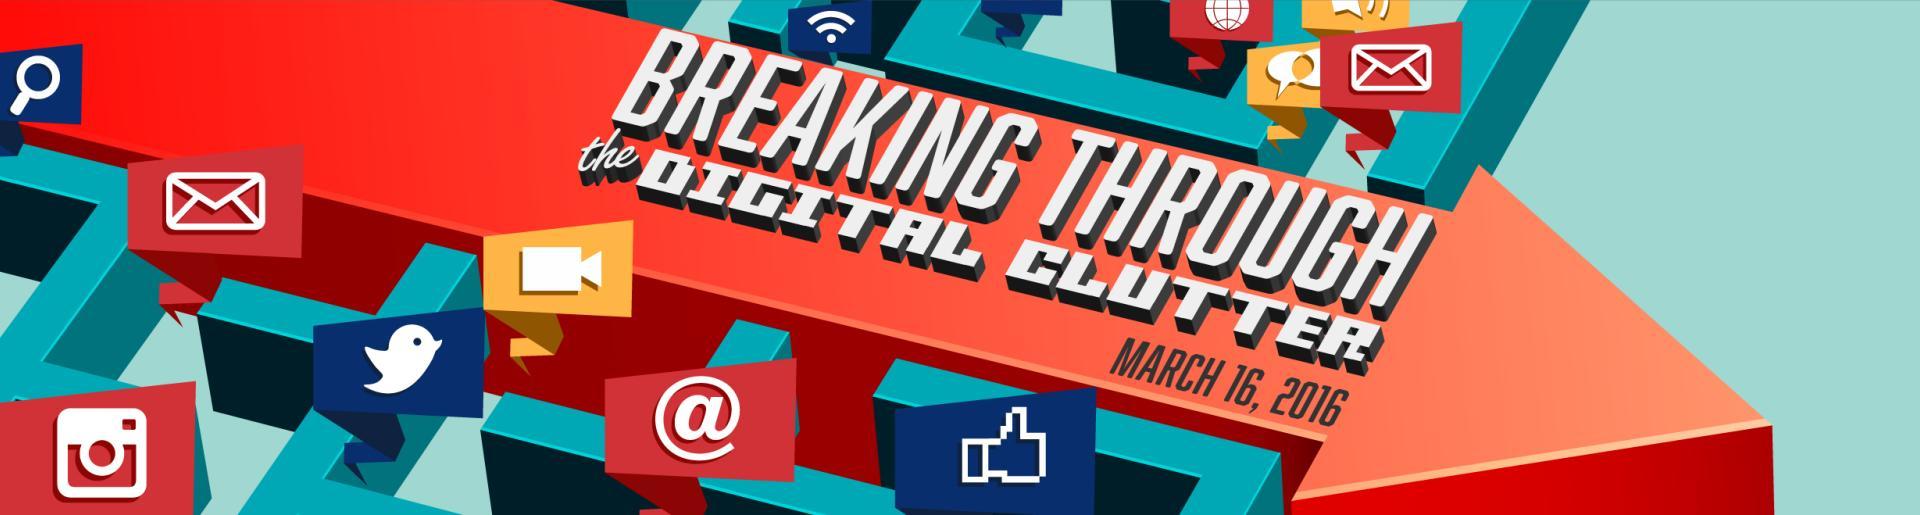 Breaking Through the Digital Clutter :: Partner Event 2016